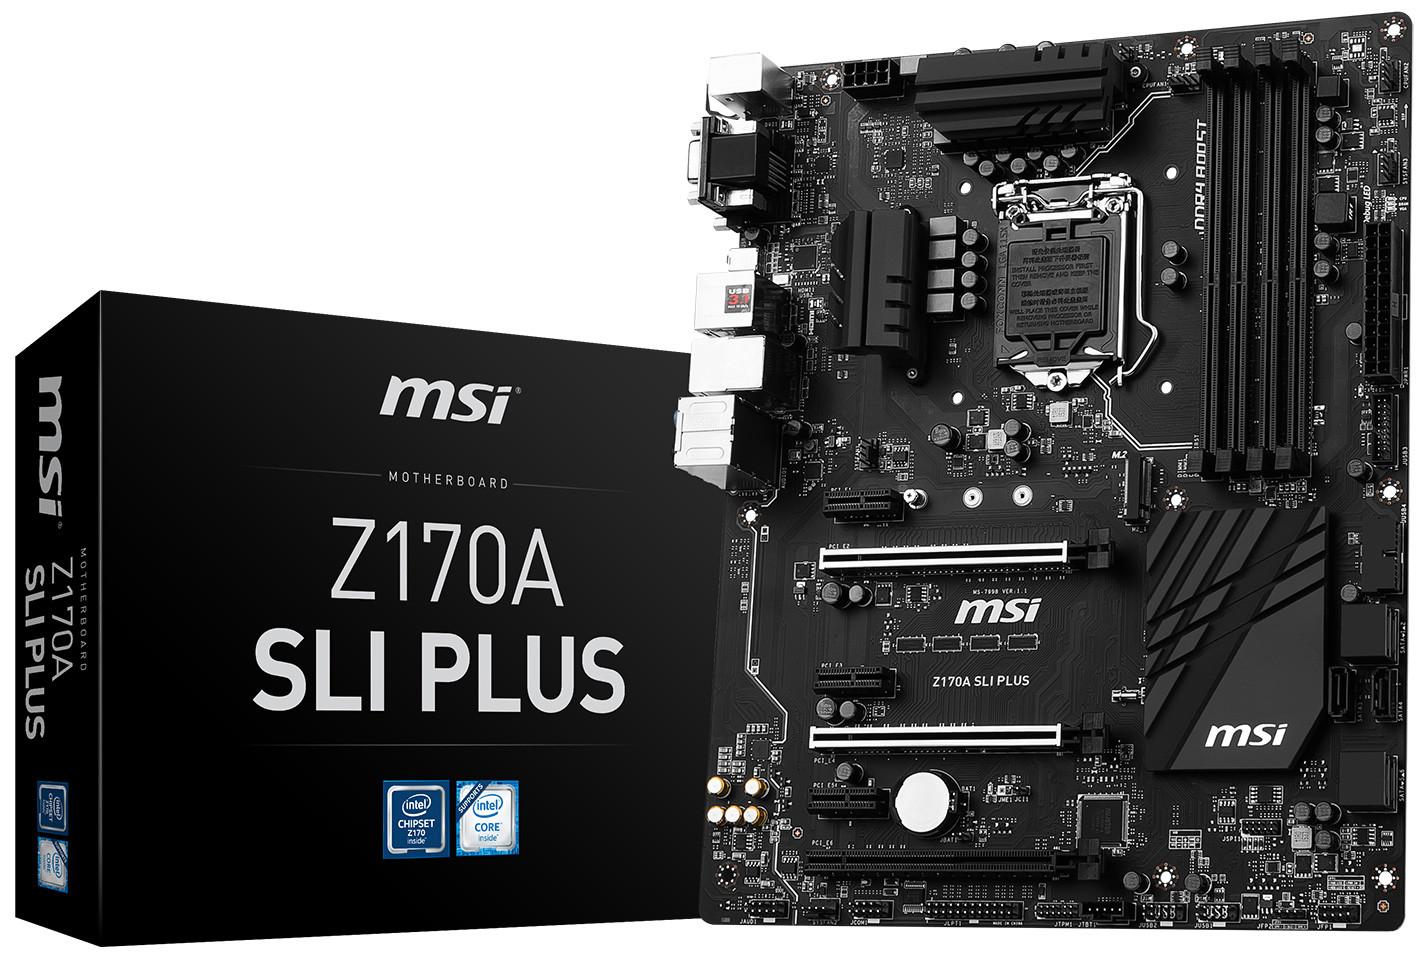 MSI Z170A SLI Plus